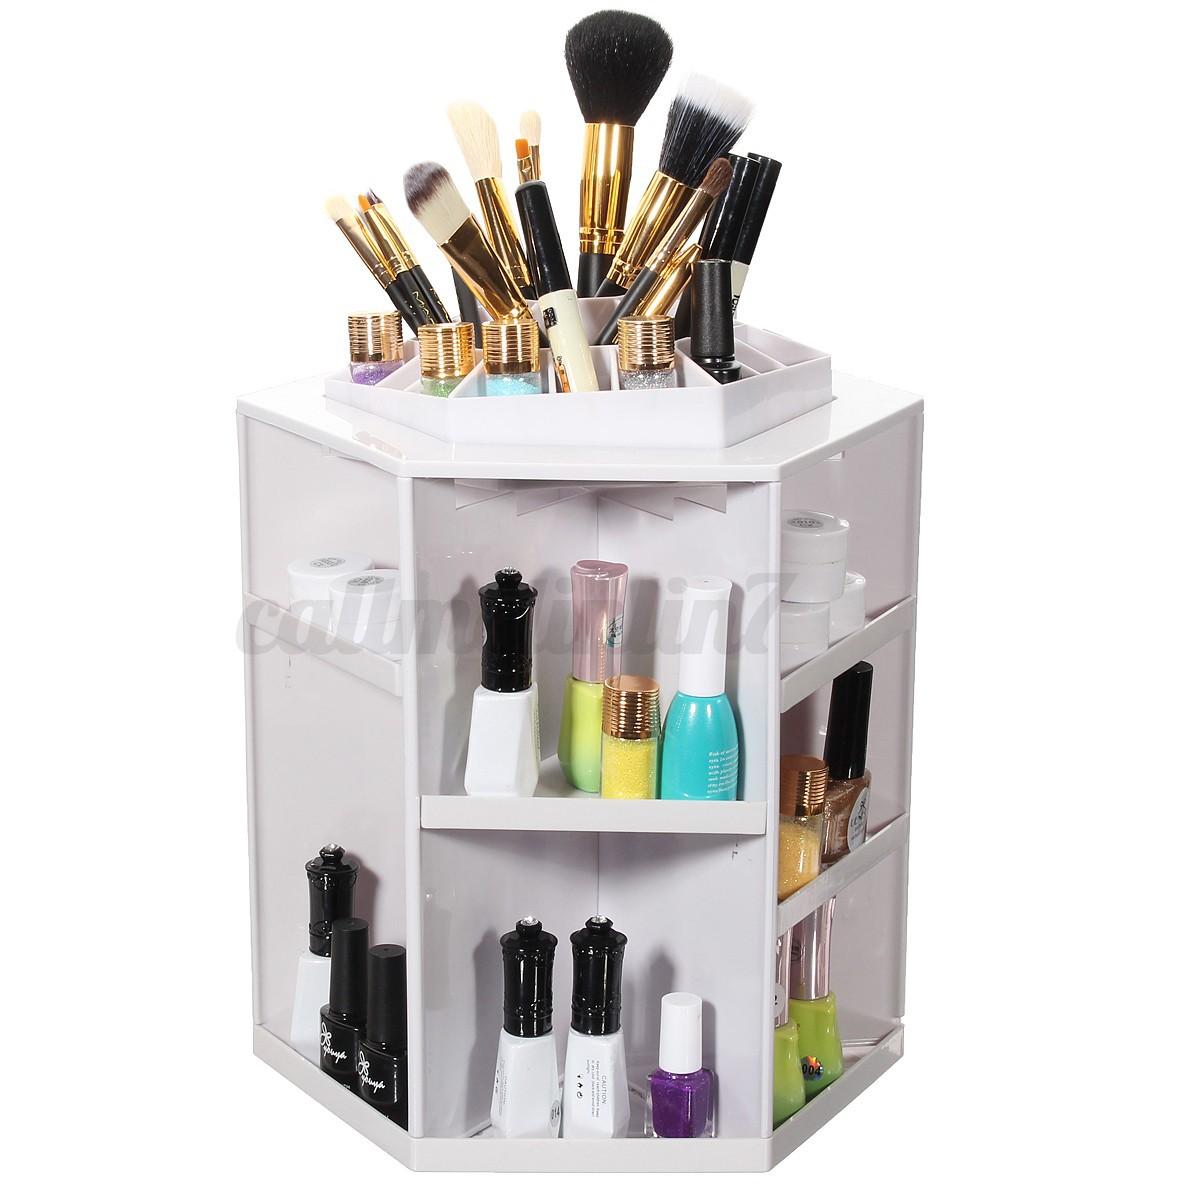 360 drehung diy kosmetik make up organizer aufbewahrung. Black Bedroom Furniture Sets. Home Design Ideas